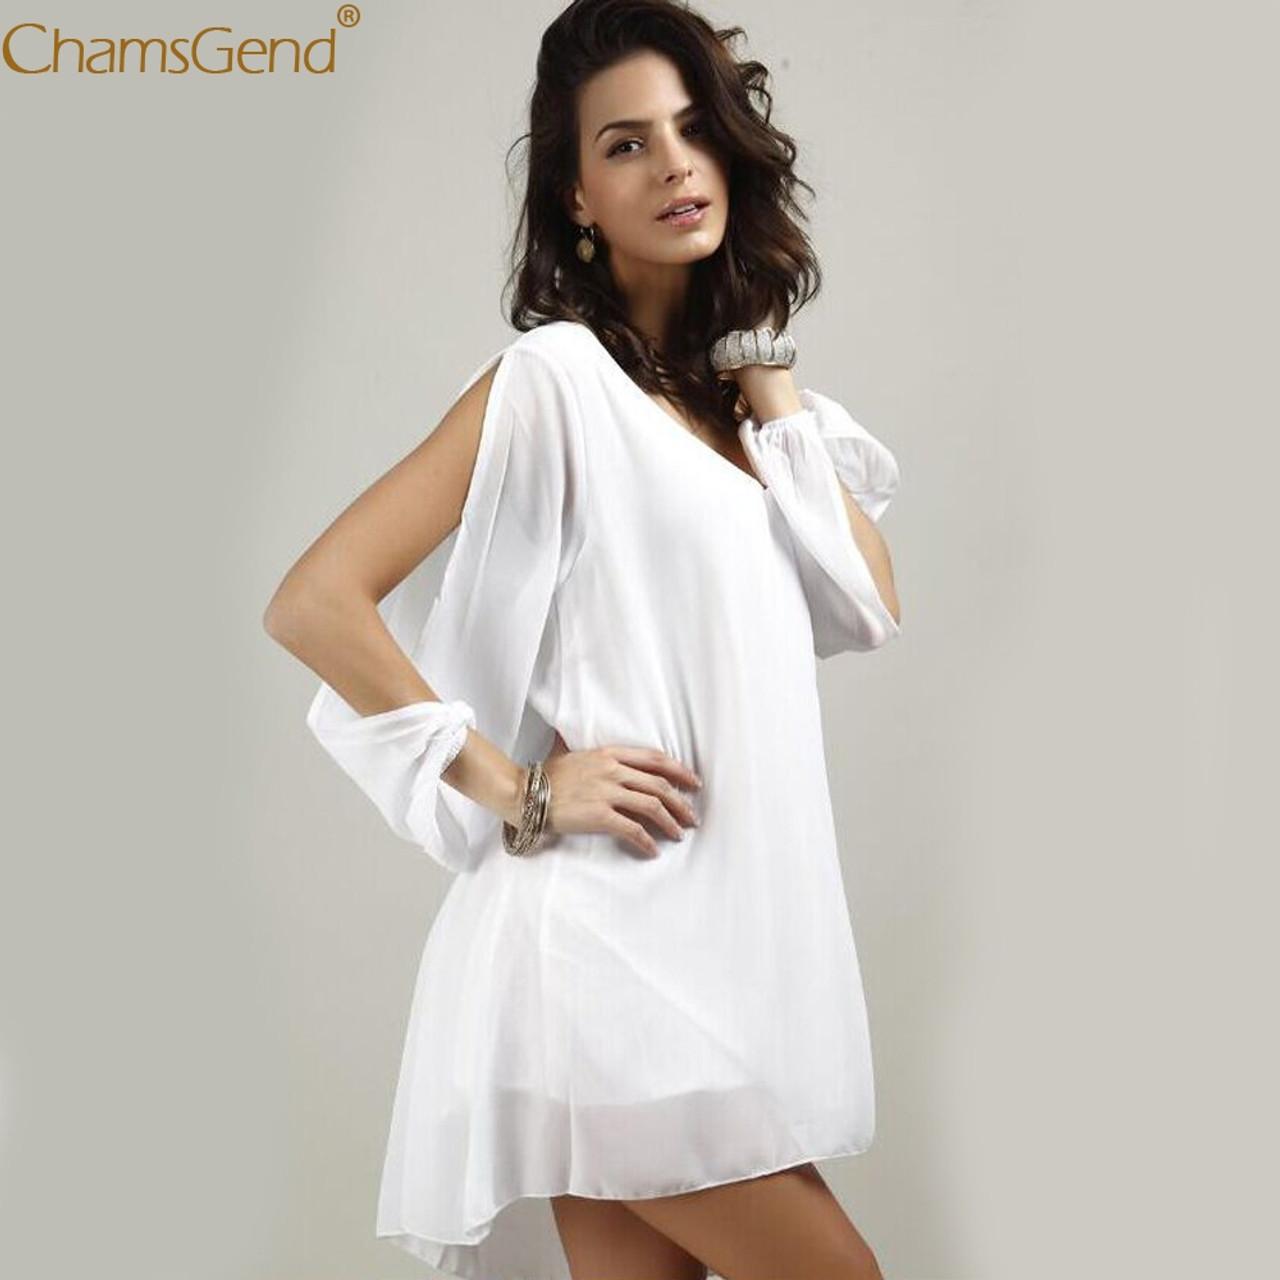 6edcb515363 Lady summer dress 2019 White Casual Cocktail Short Mini Dress formal dress  women elegant dresses woman ...